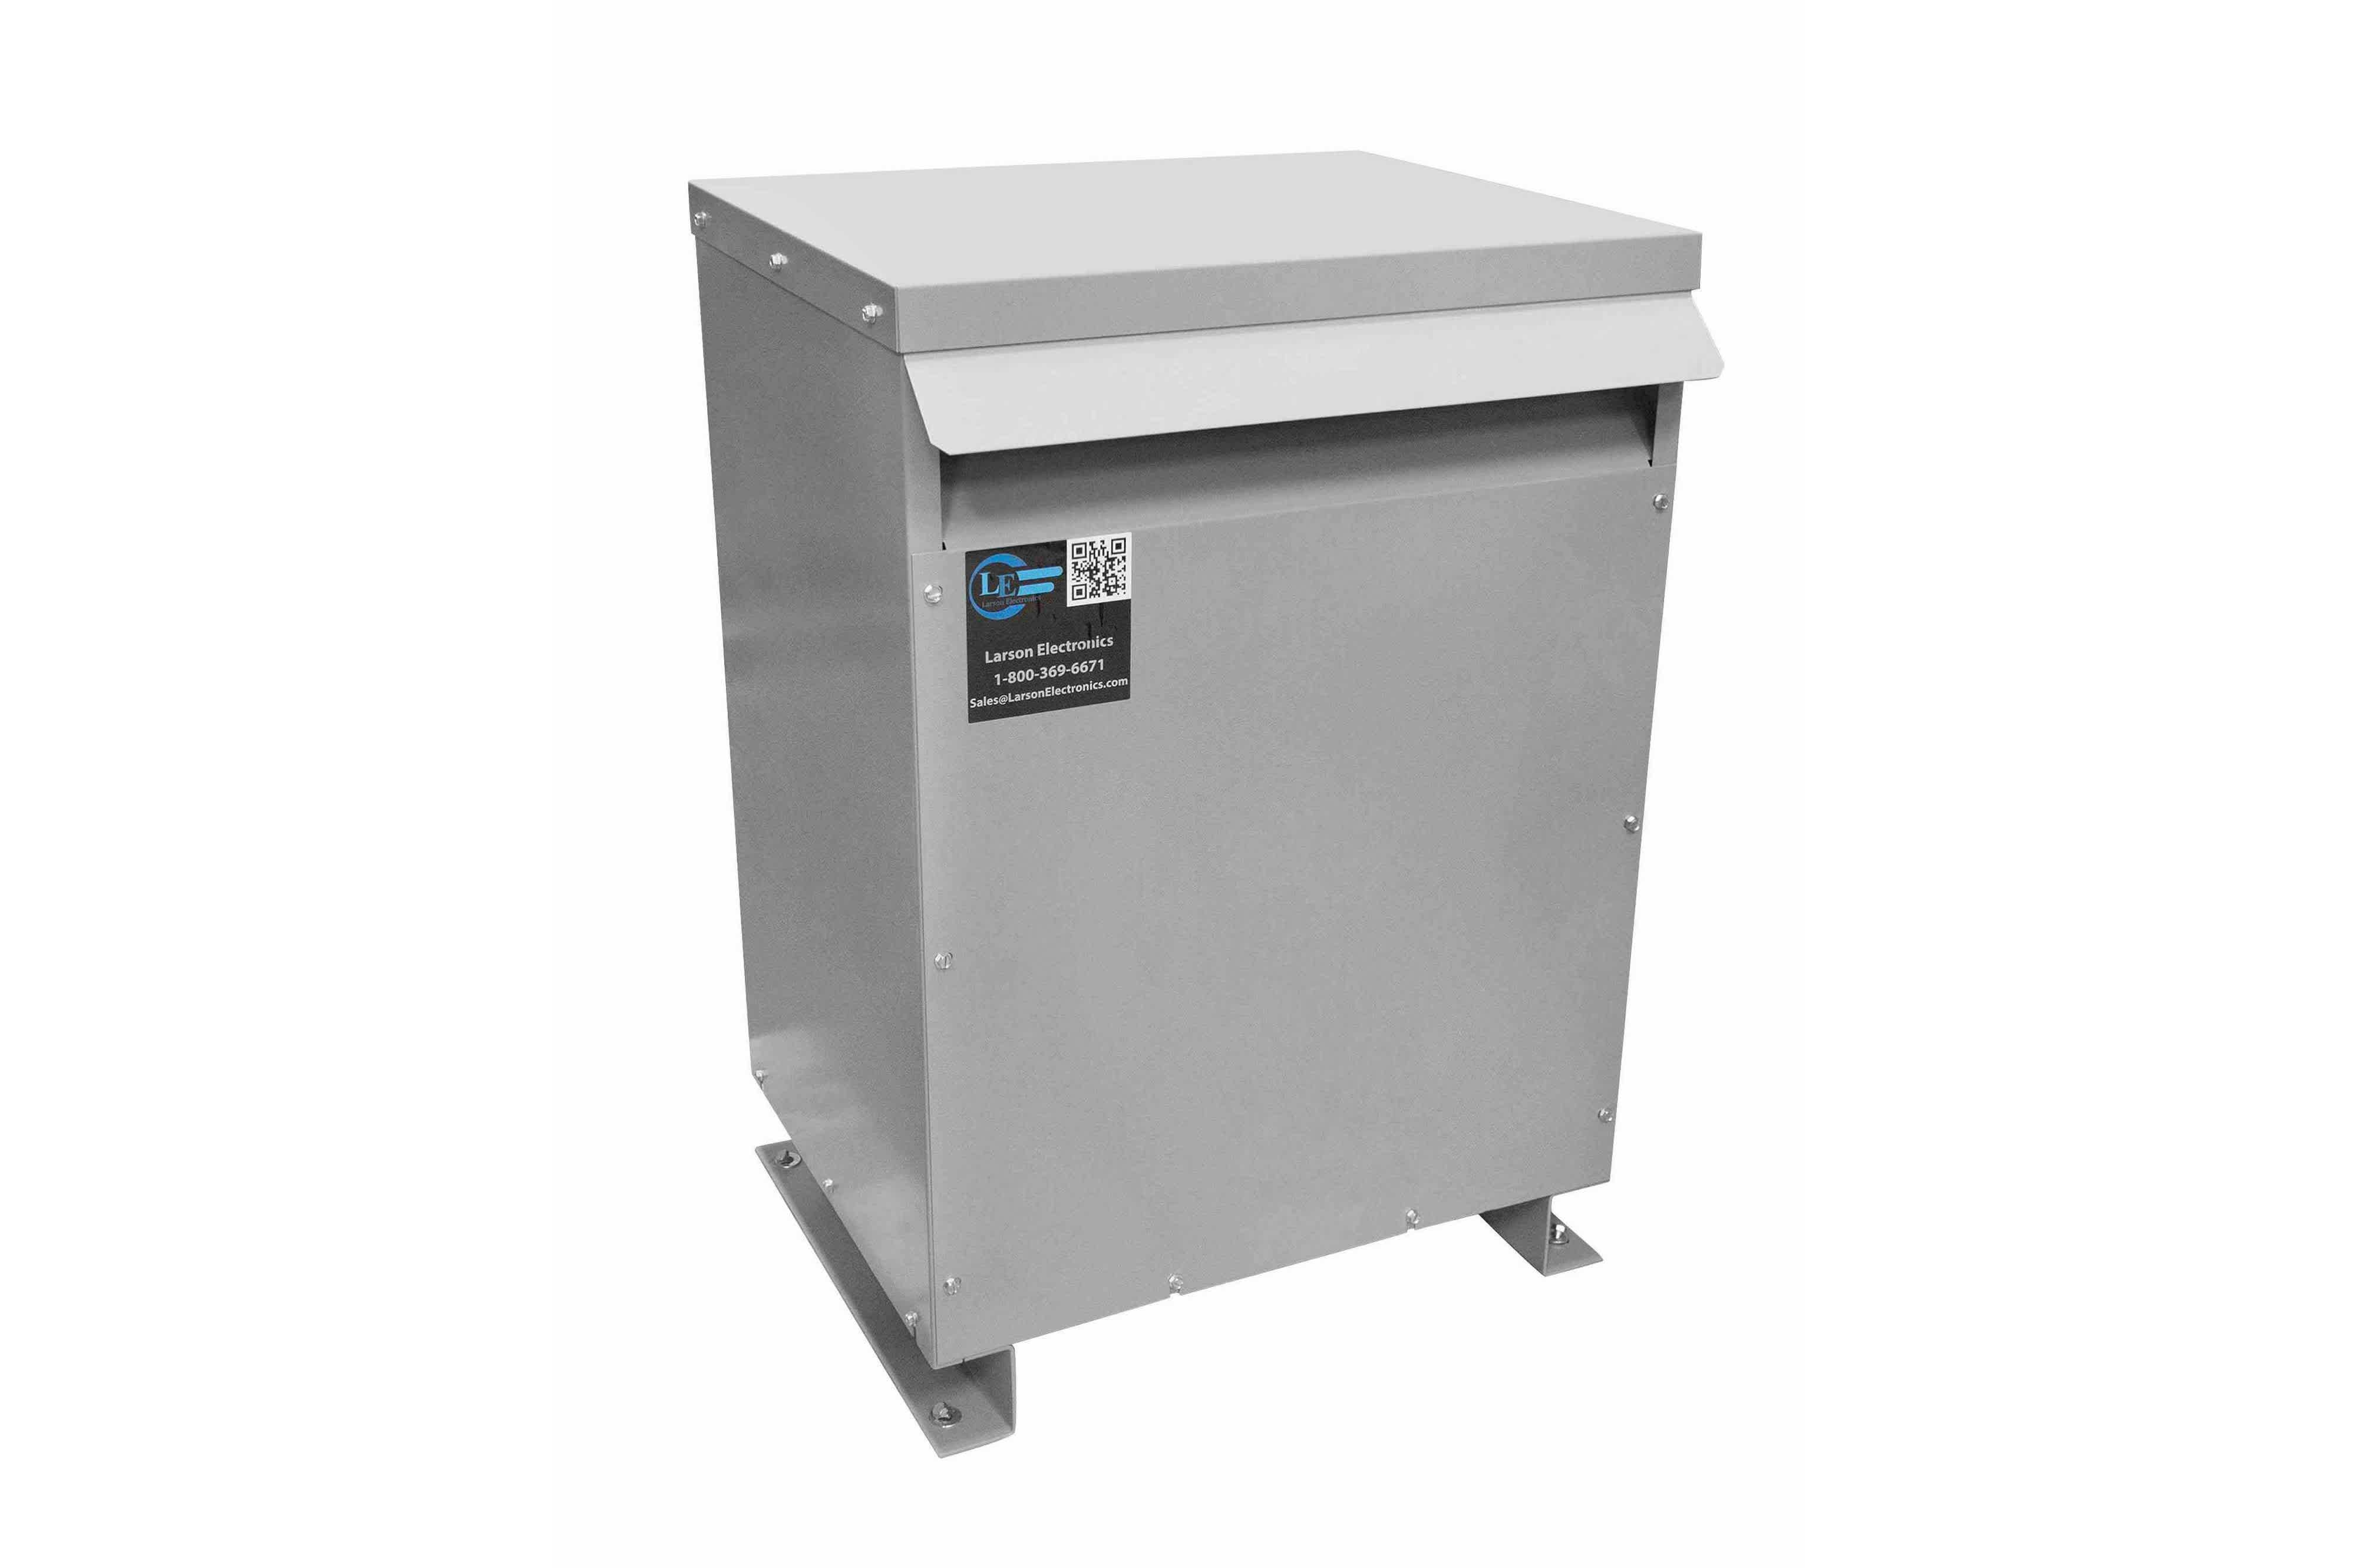 12 kVA 3PH Isolation Transformer, 480V Wye Primary, 575V Delta Secondary, N3R, Ventilated, 60 Hz